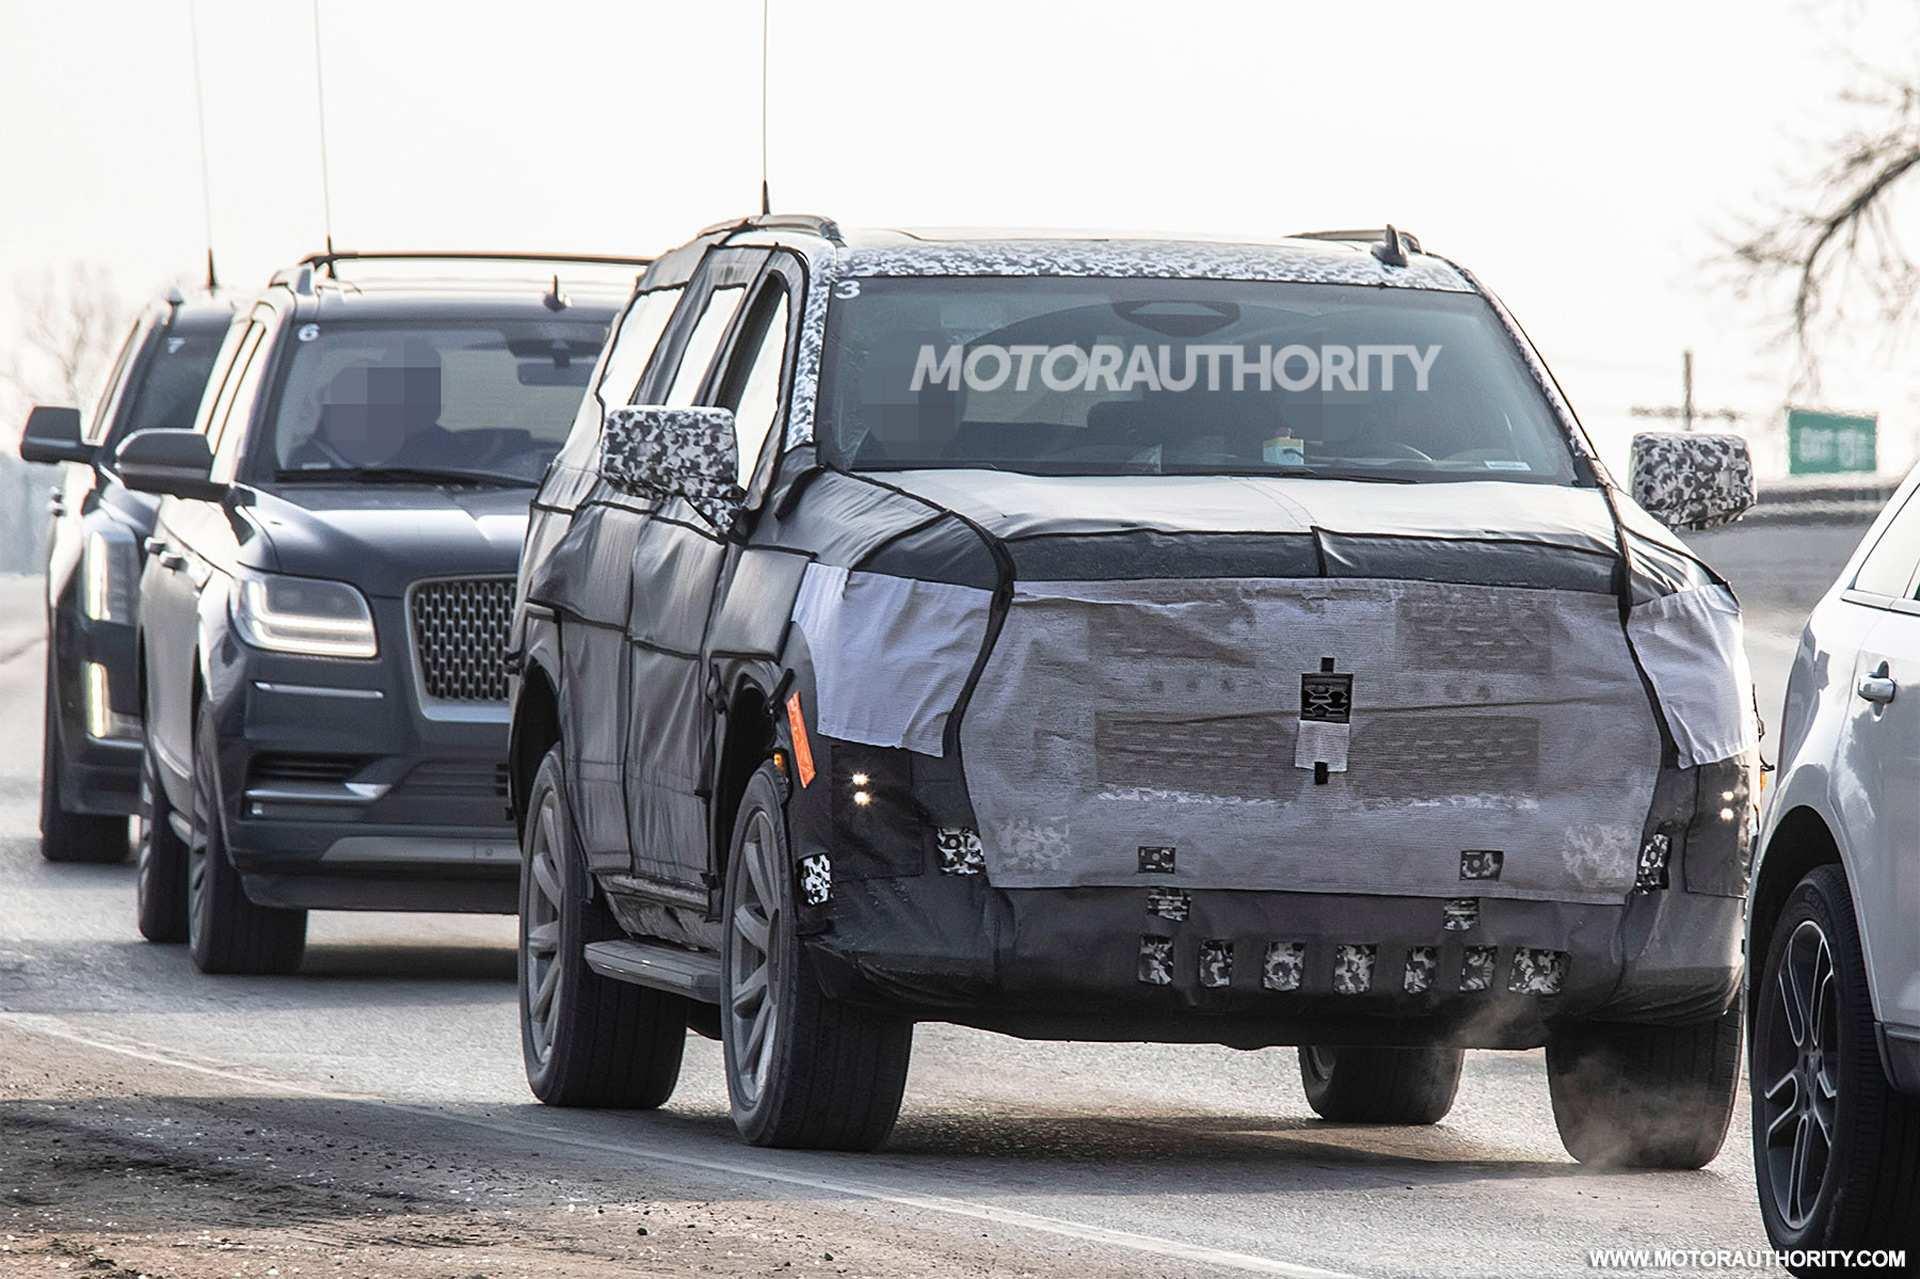 43 Great 2020 Cadillac Escalade Latest News Concept for 2020 Cadillac Escalade Latest News